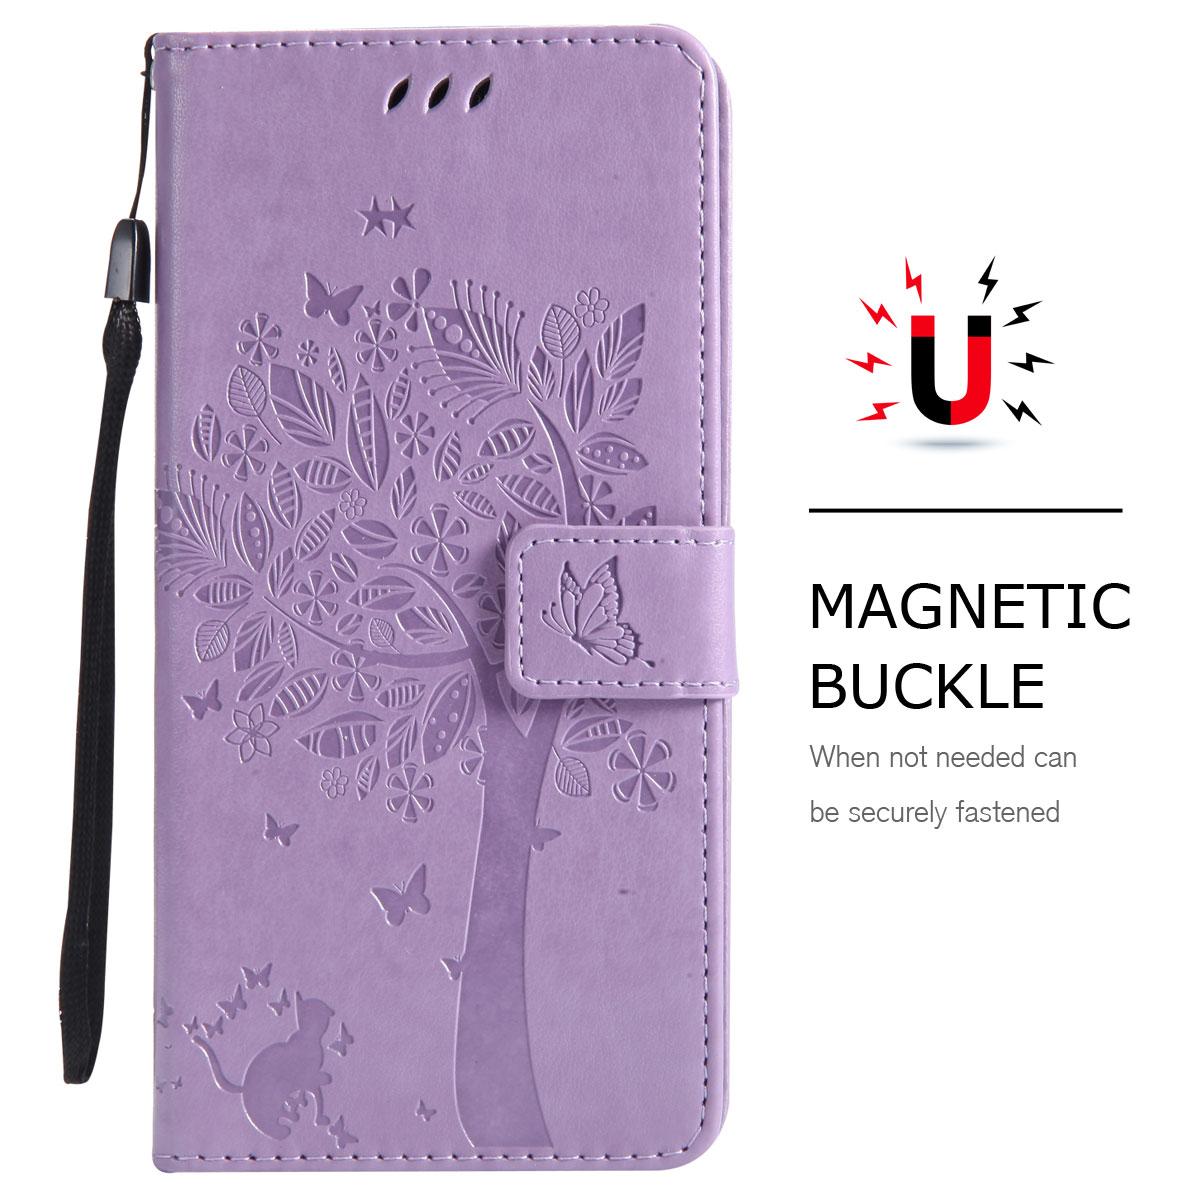 Magnetic-Leather-Credit-Card-Holder-Flip-Case-Cover-For-Google-Pixel-2-2-XL thumbnail 100